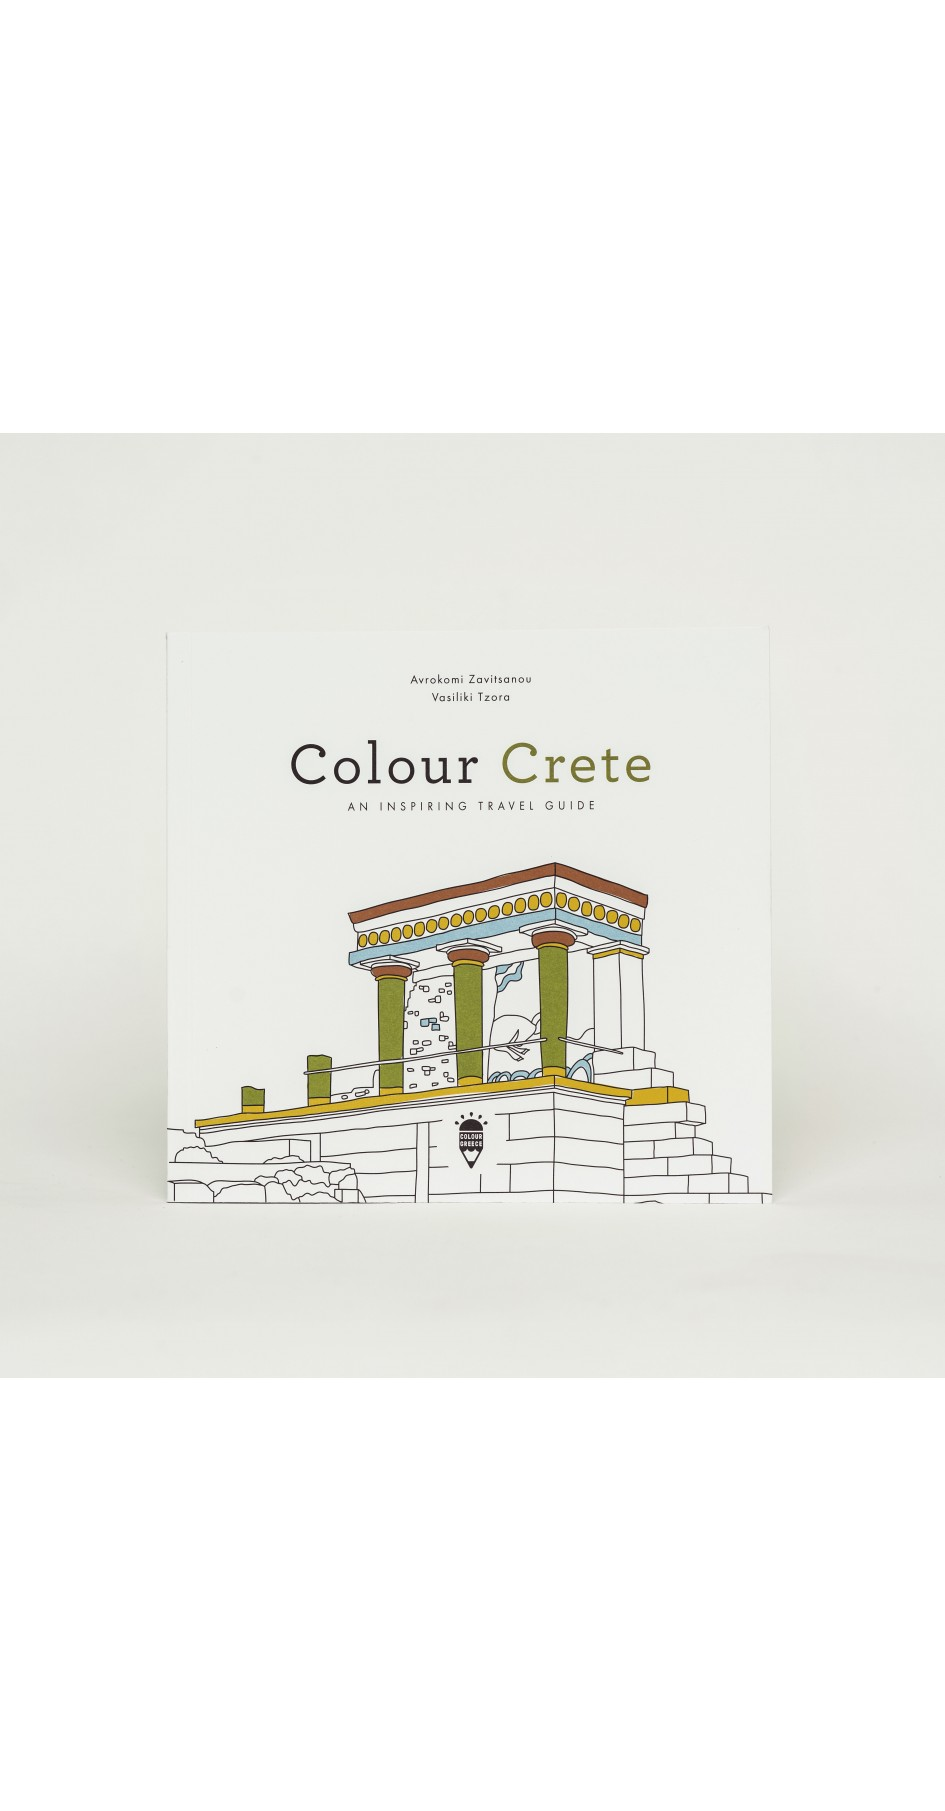 Colour Crete - An Inspiring Travel Guide